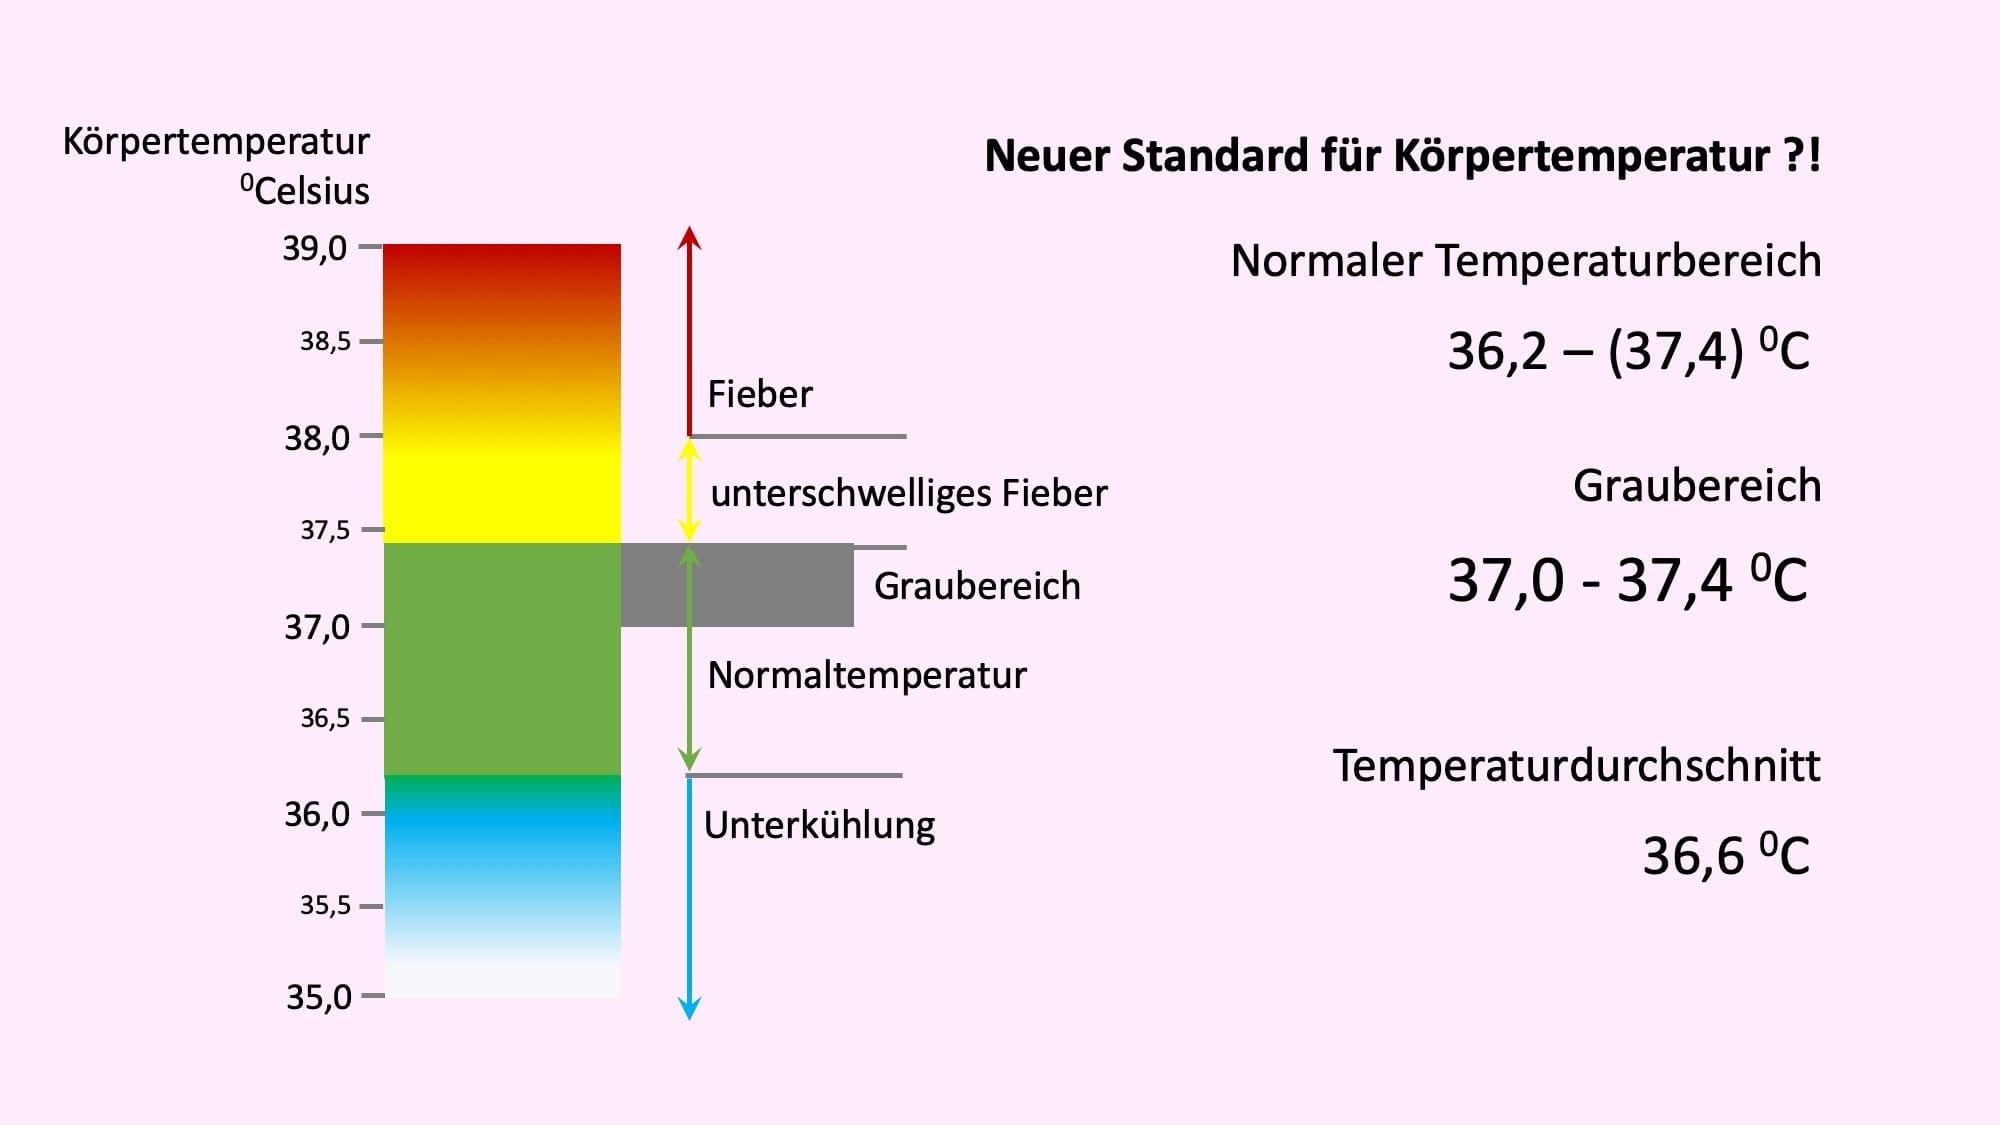 Körpertemperatur mensch